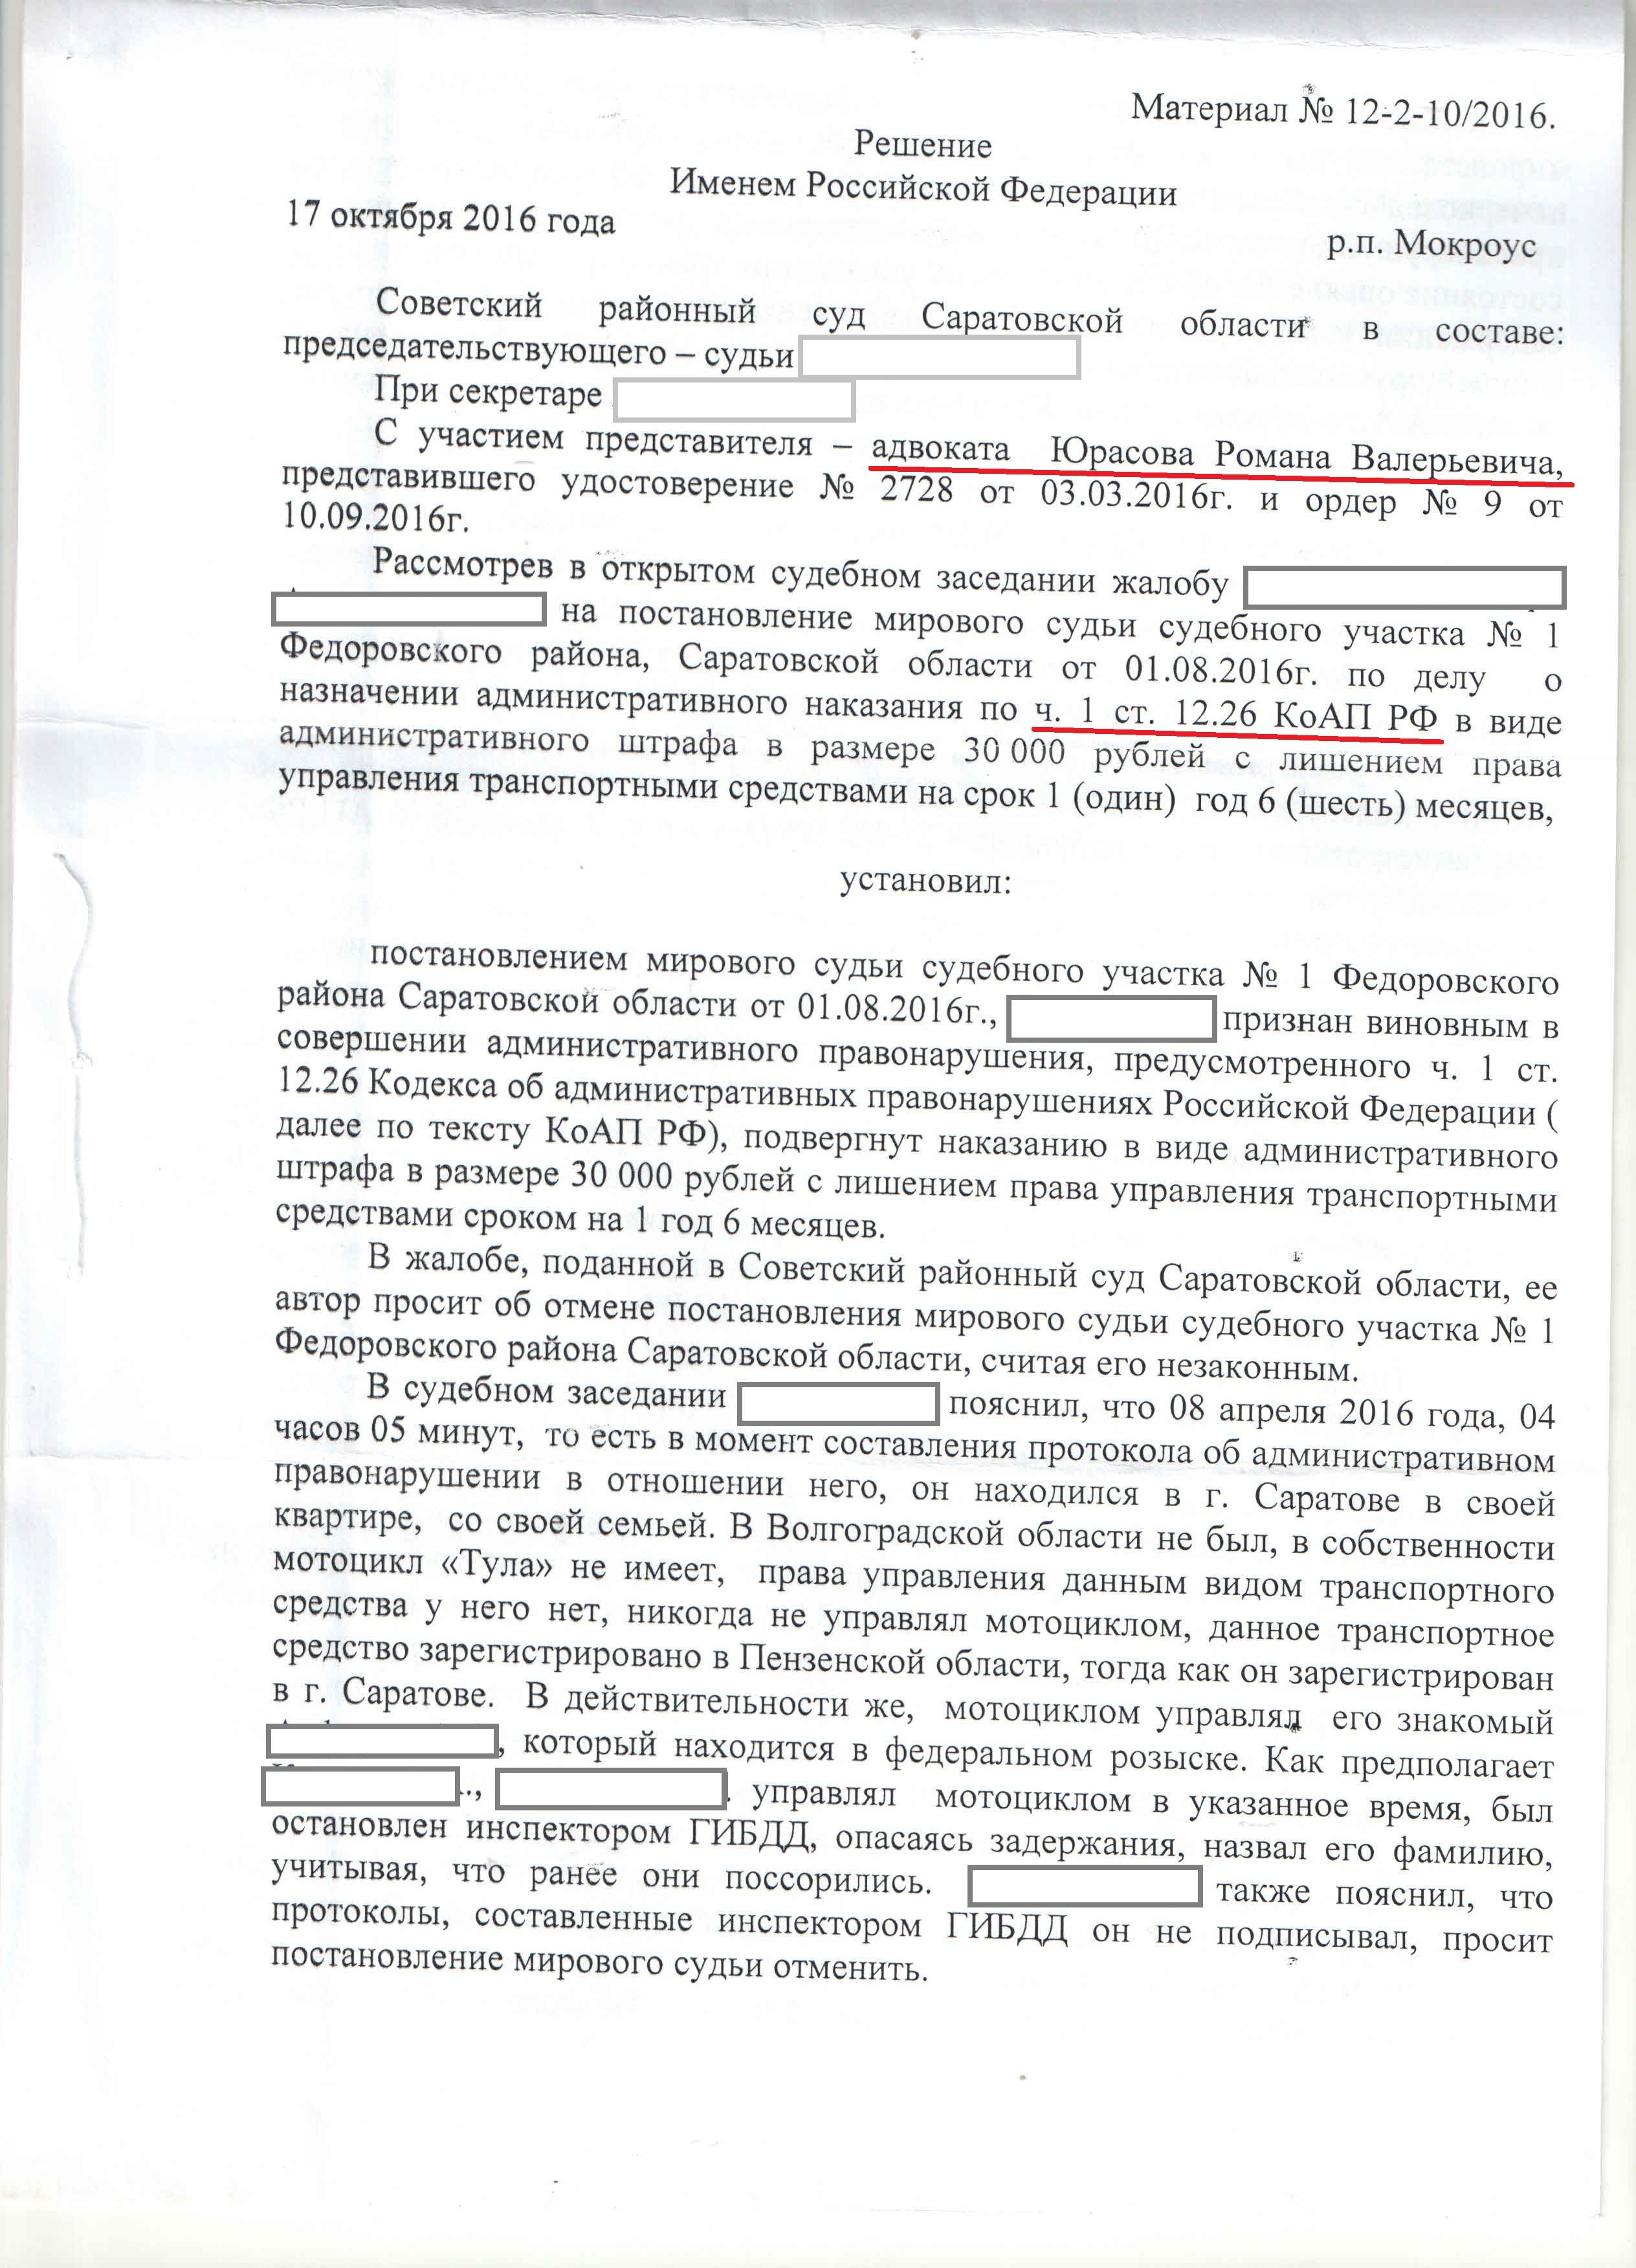 Ч.1 ст.12.26 адвокат